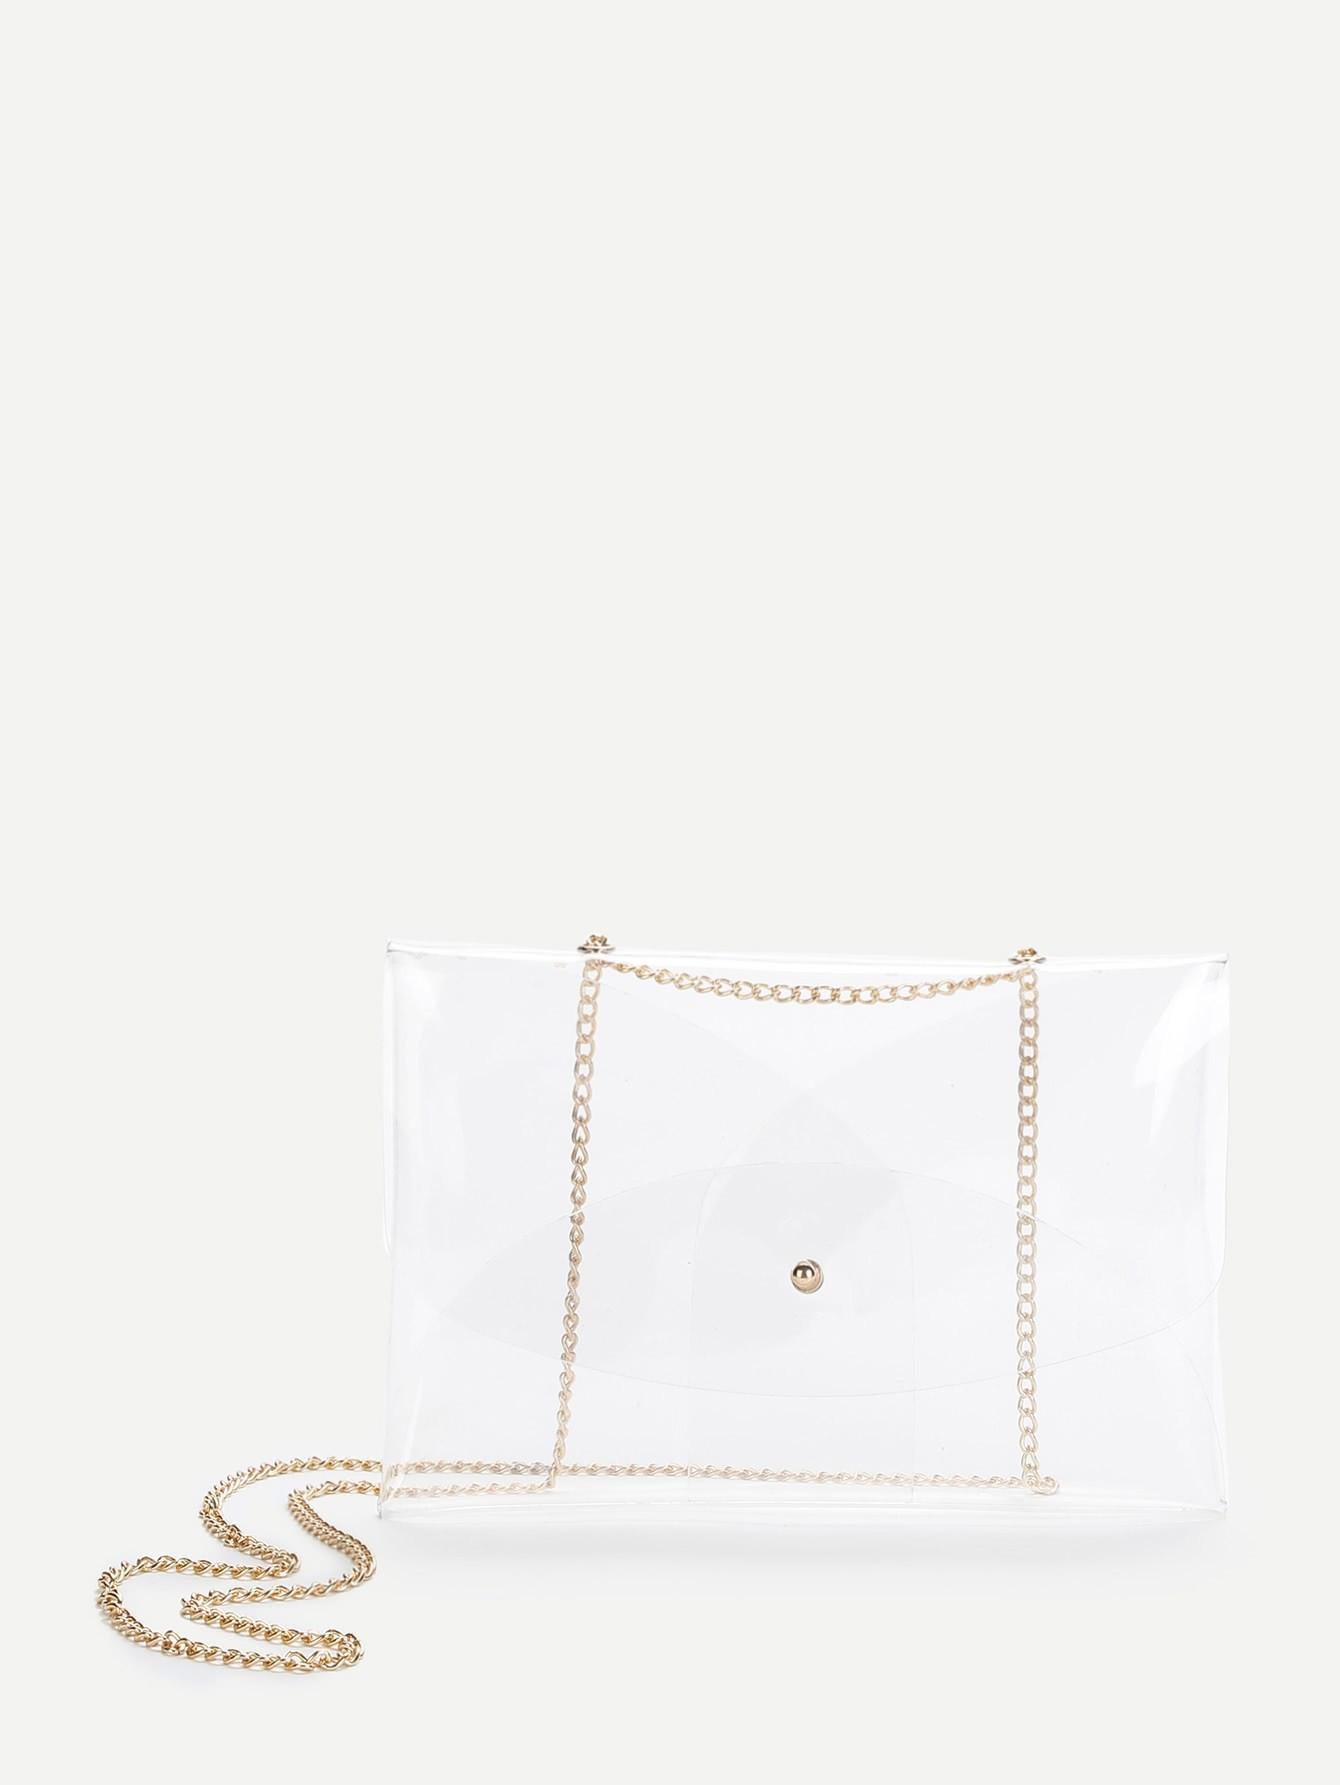 PVC Clear Crossbody Chain Bag exclusive shinny kaki shaggy deer pvc fuax leather 25cm small size steel chian fold over lady luxury chain bag